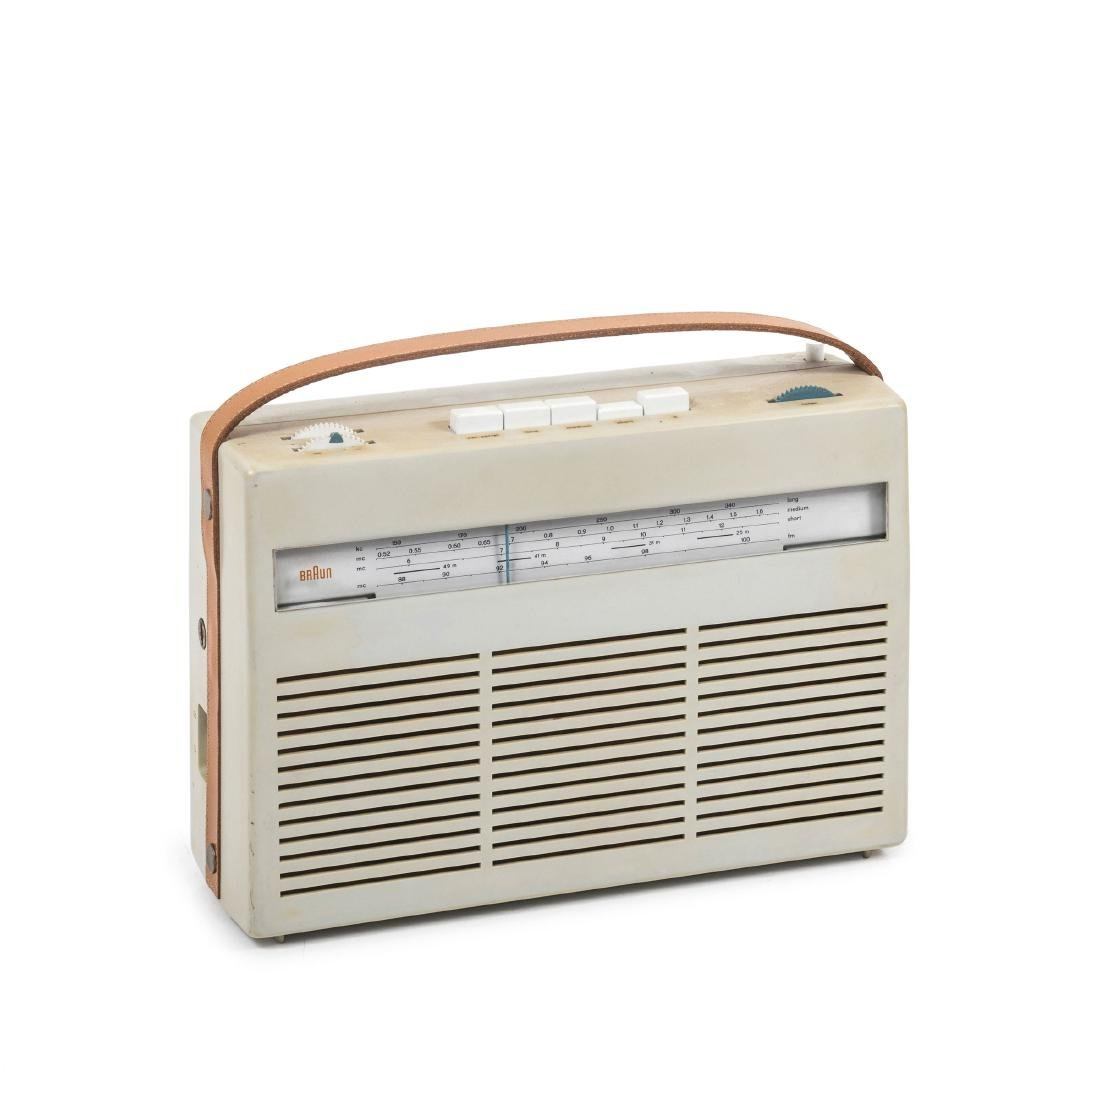 'Transistor K' radio, 1959